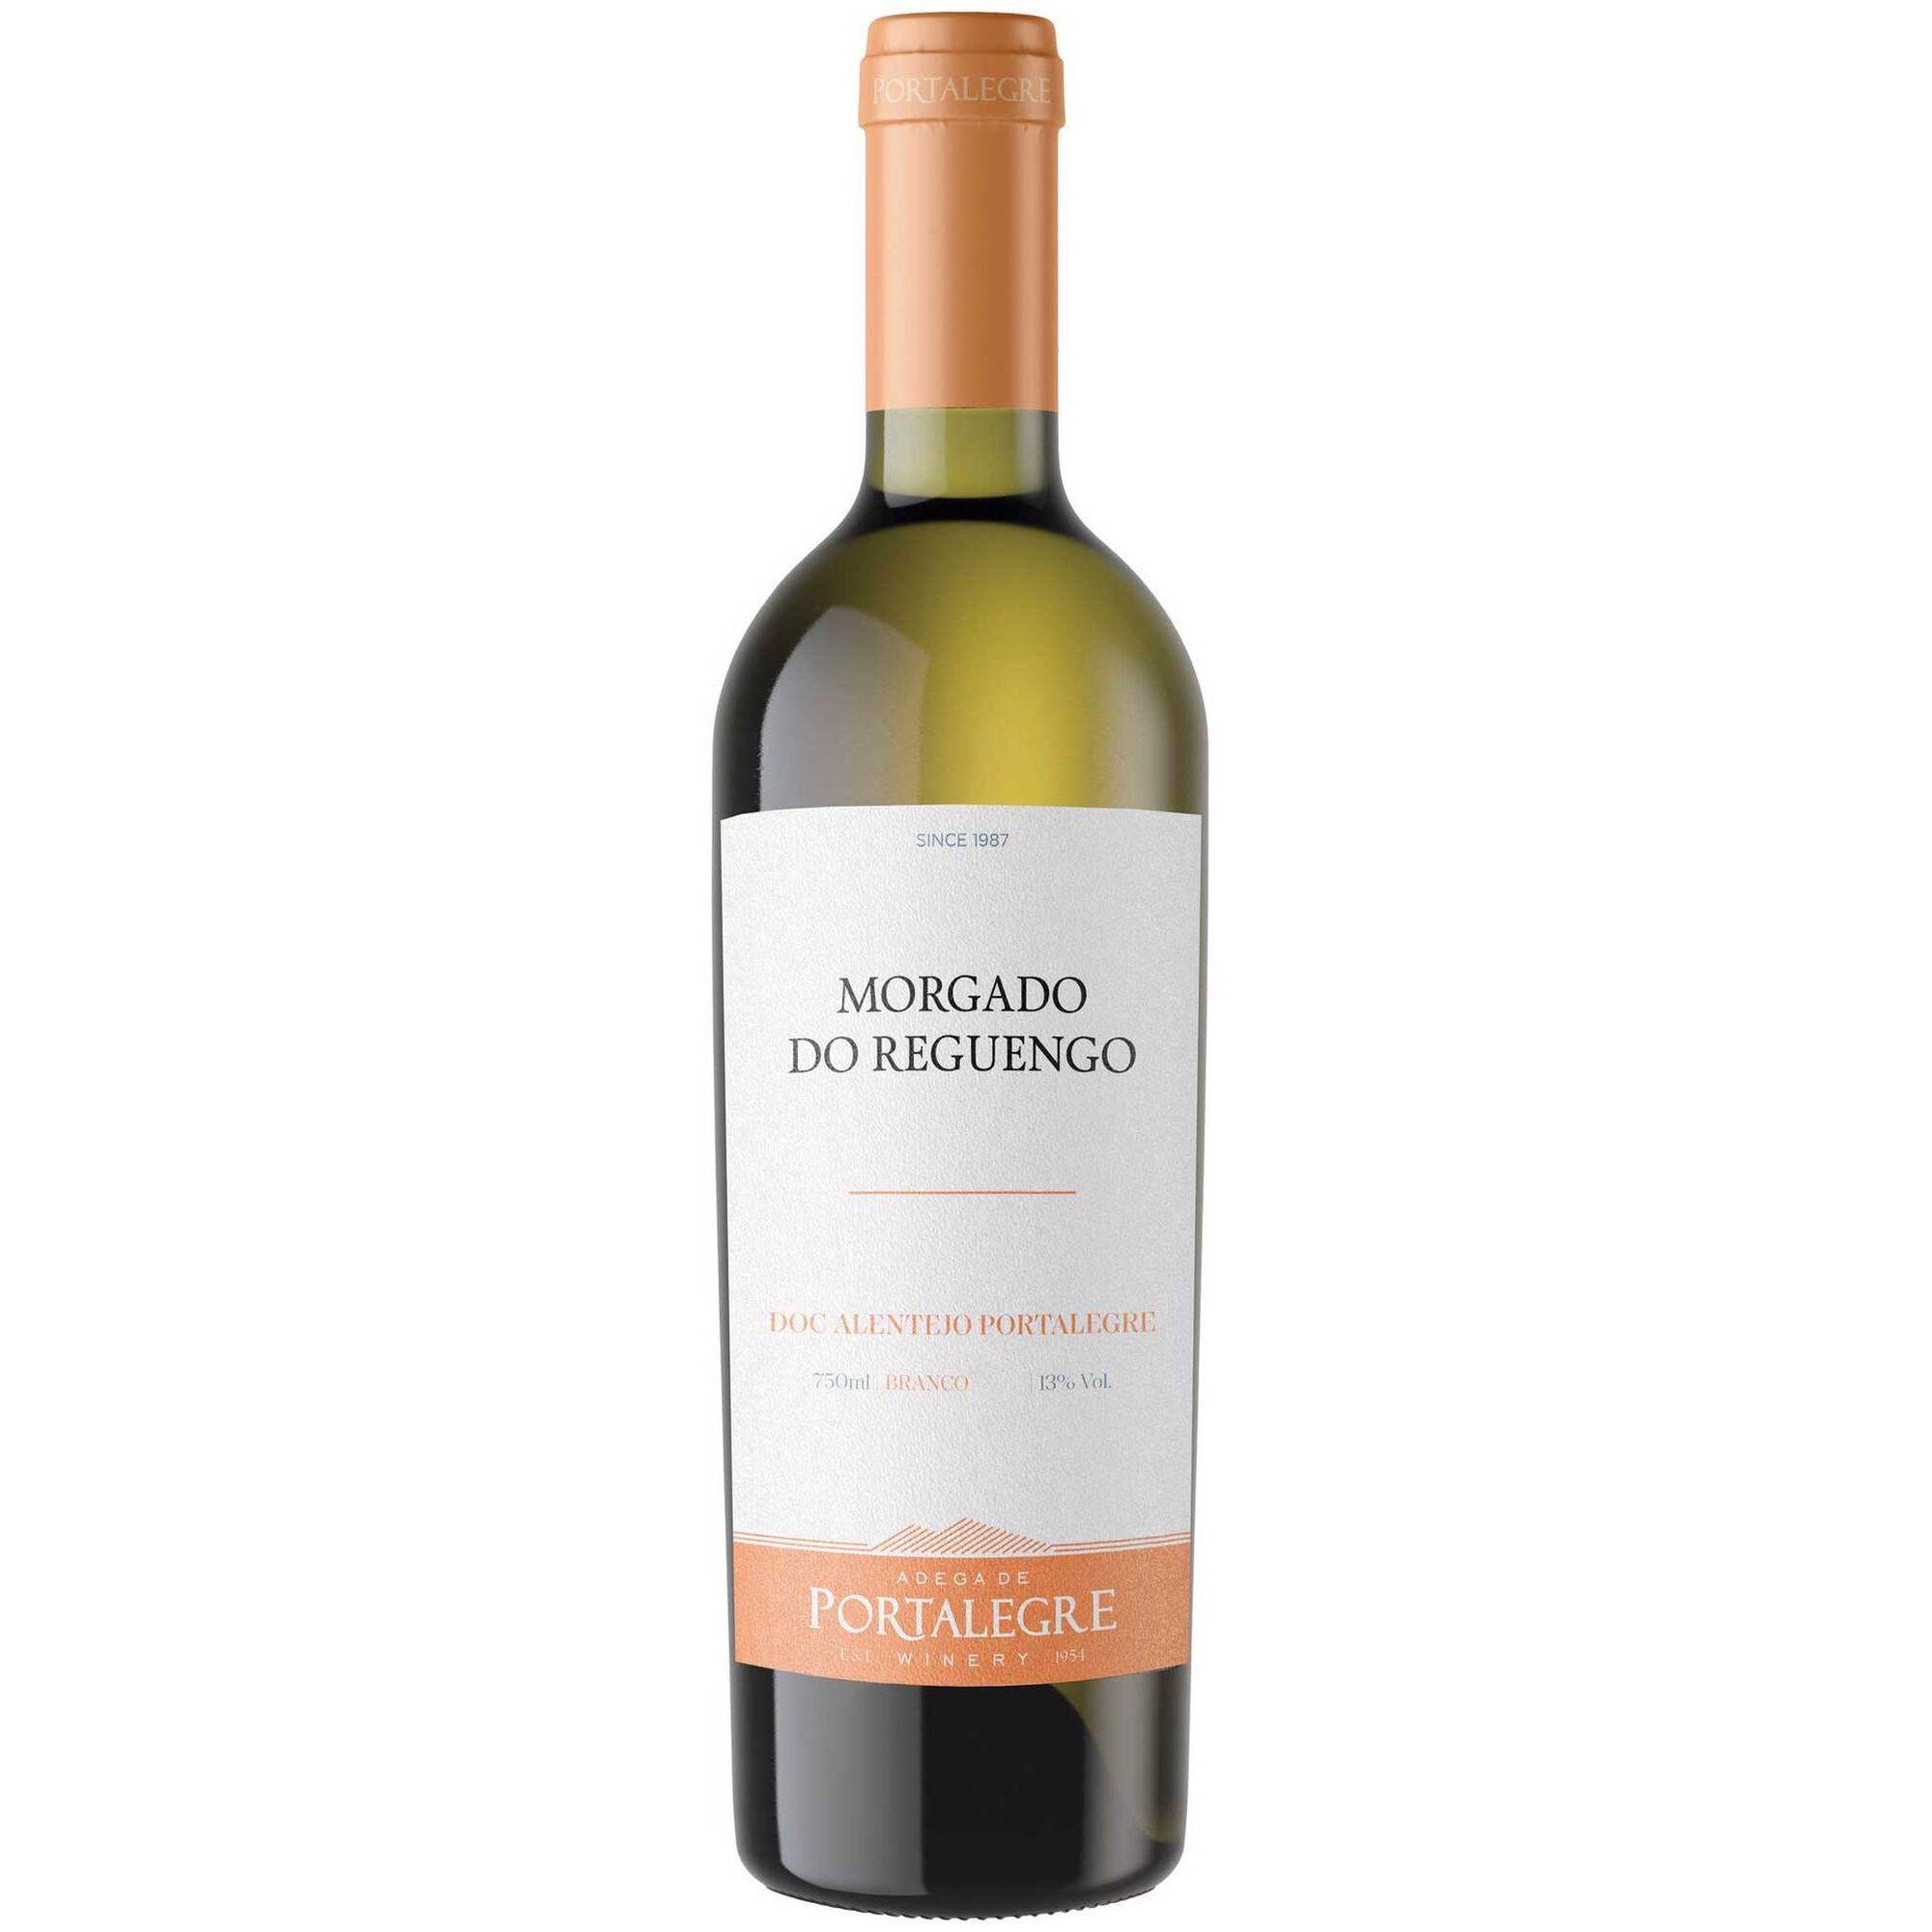 Morgado do Reguengo DOC Alentejo Vinho Branco